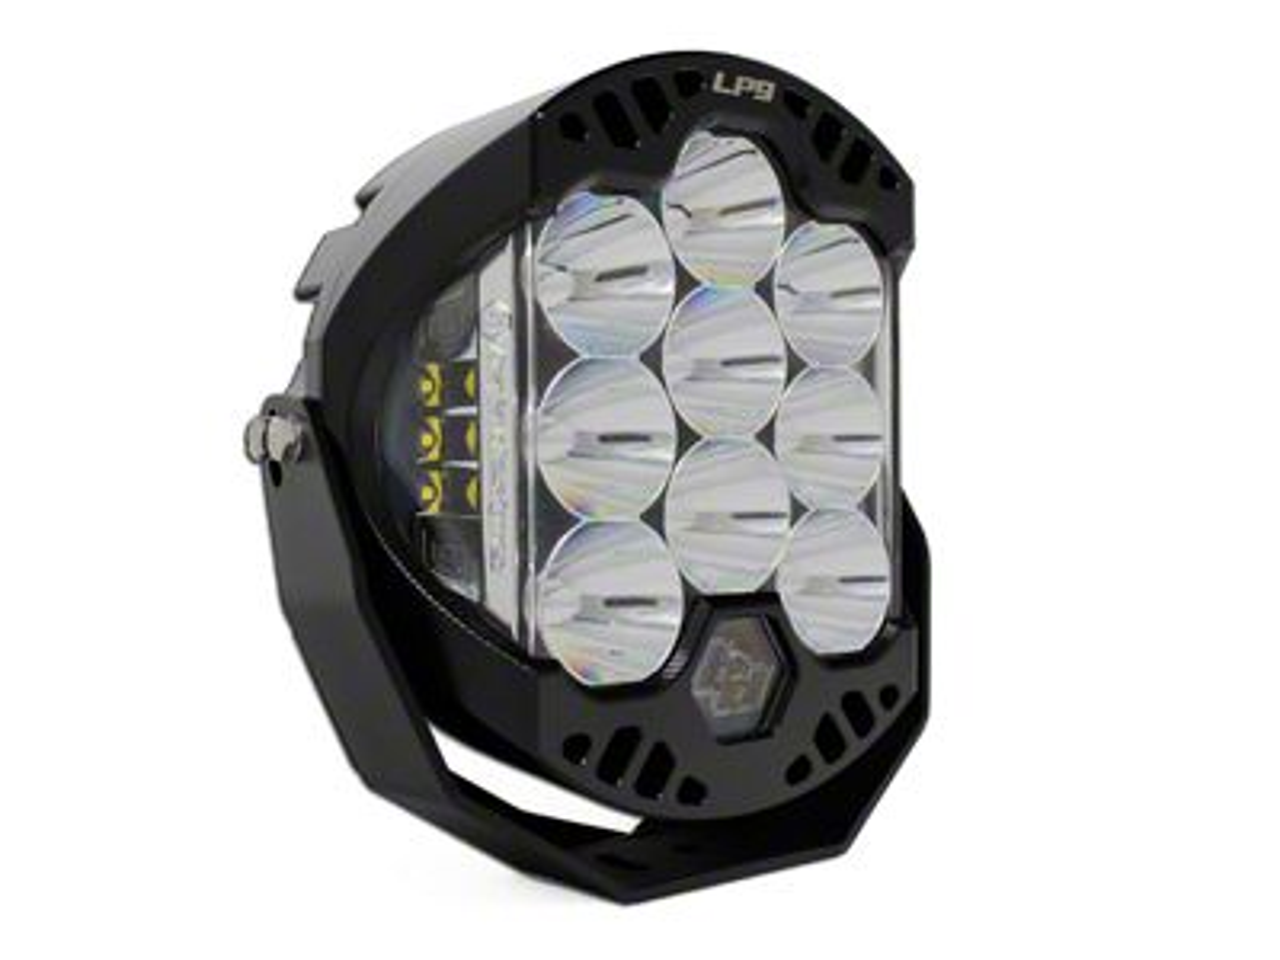 Baja Designs 8 in. LP9 Racer Edition Round LED Light - Spot Beam